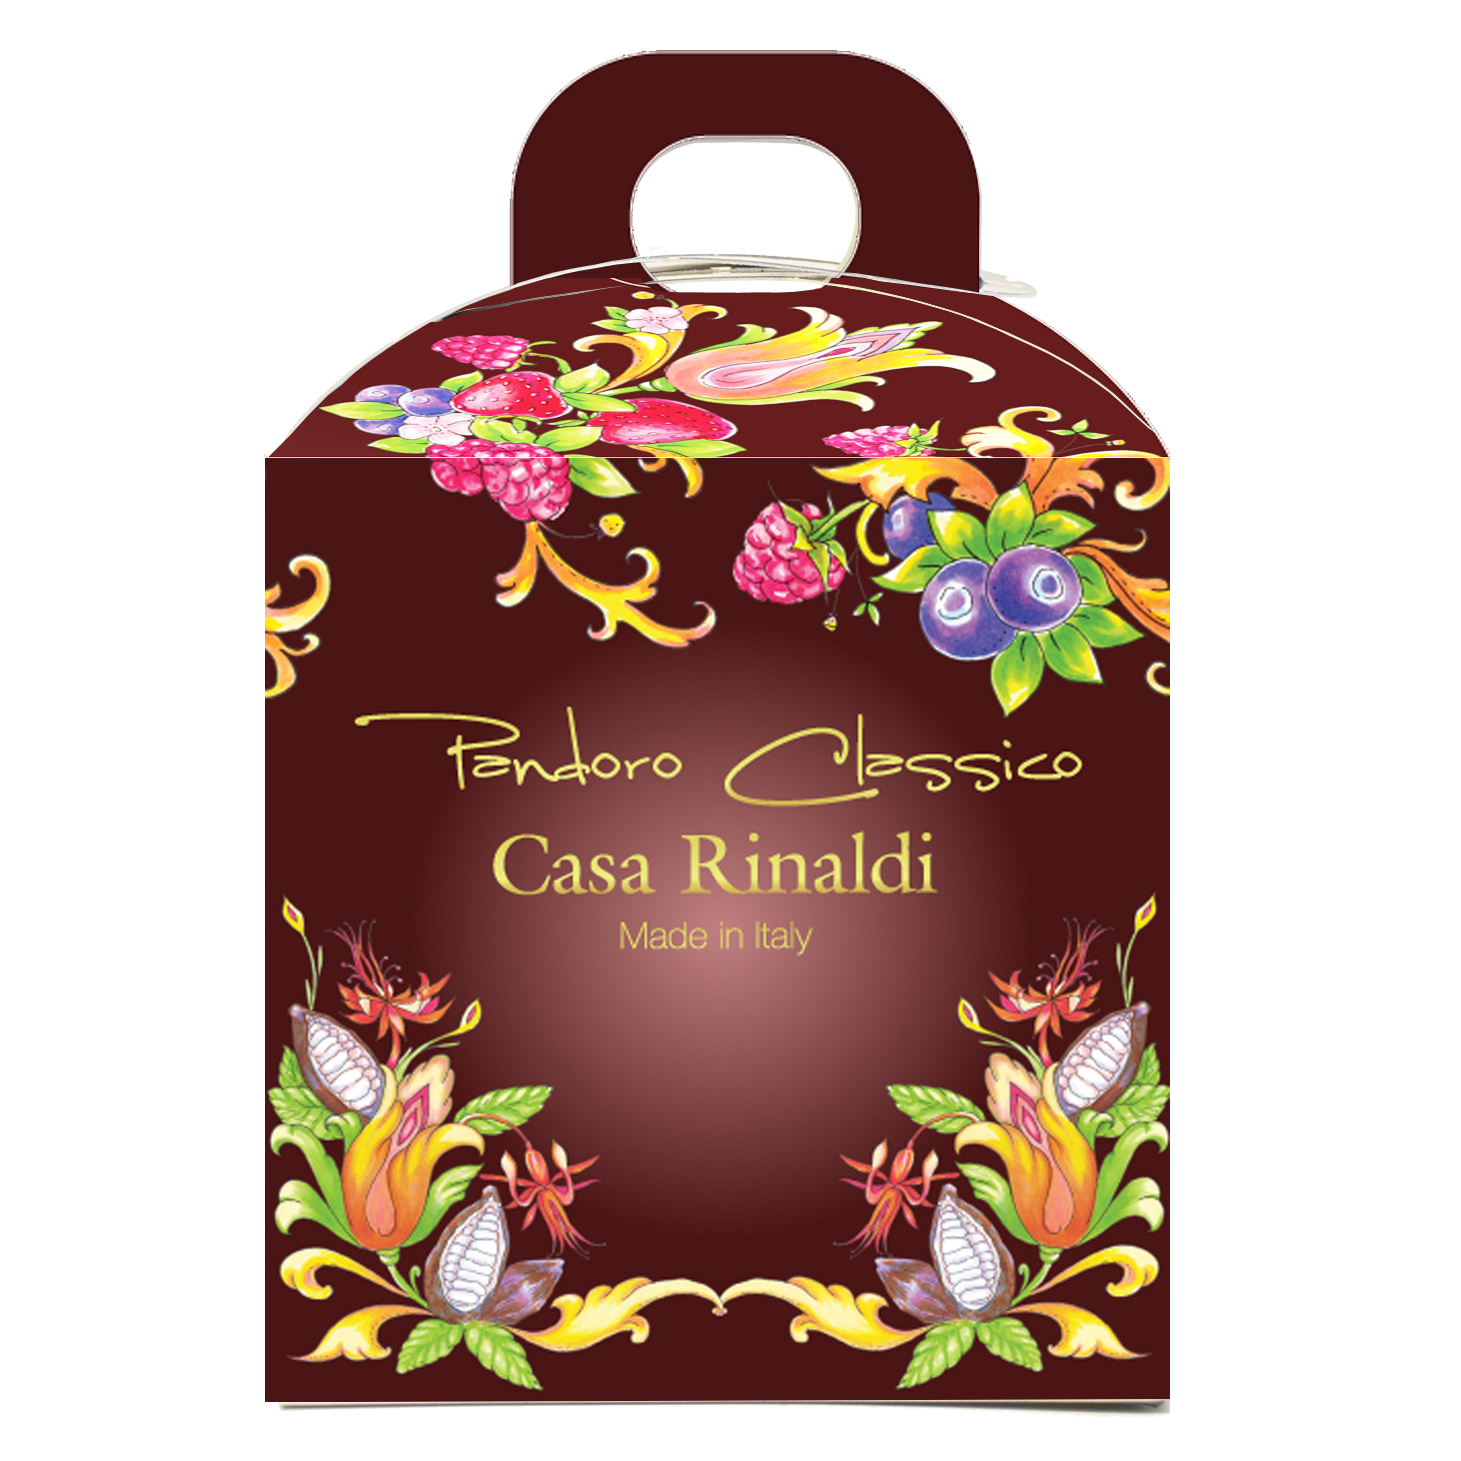 Кулич Пандоро Классический Casa Rinaldi 80 г